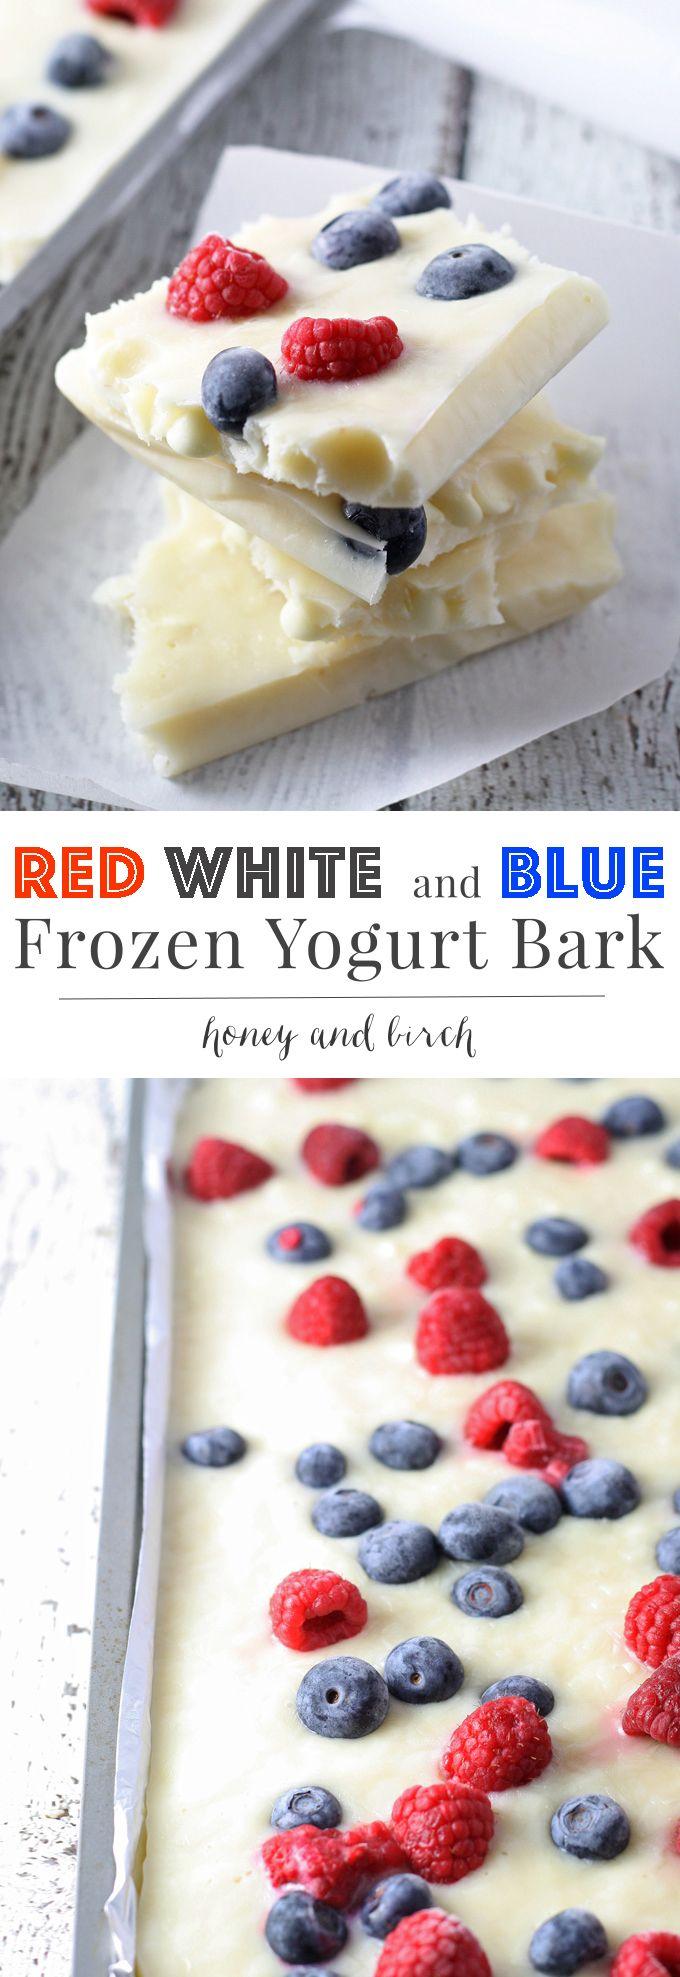 Red White and Blue Frozen Yogurt Bark